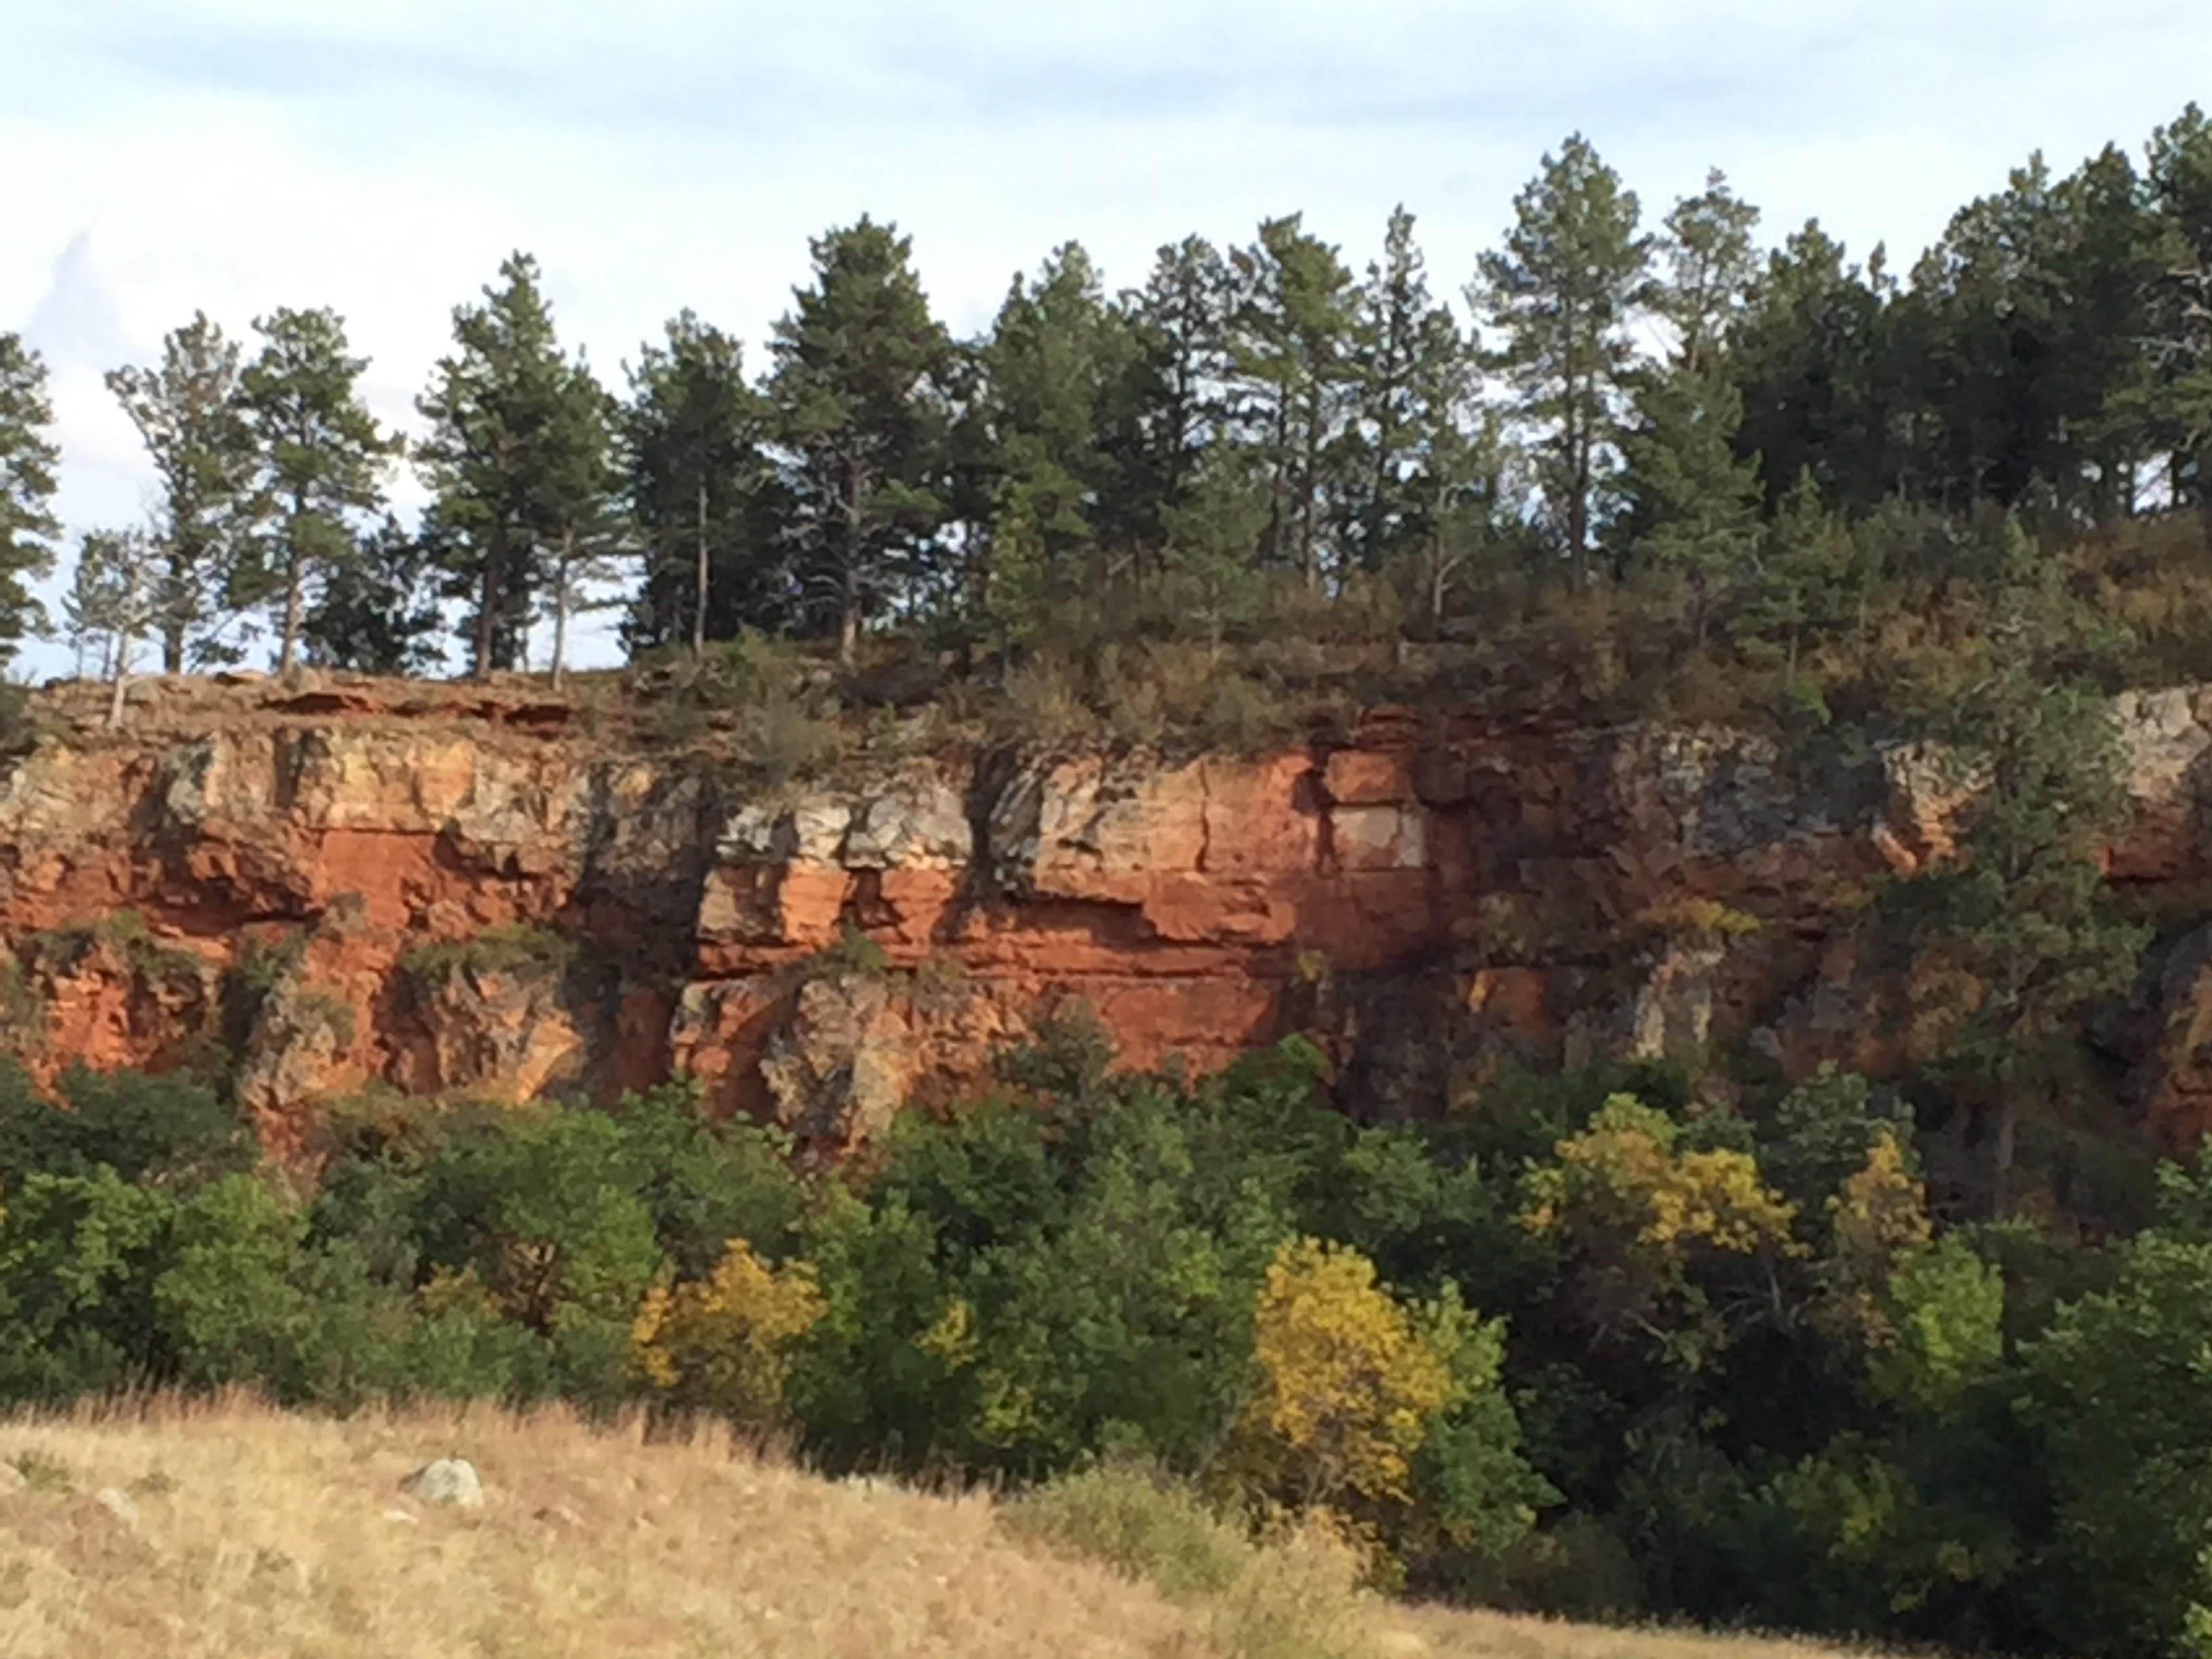 2017-09-17 Black Hills 31 Custer Wildlife 02